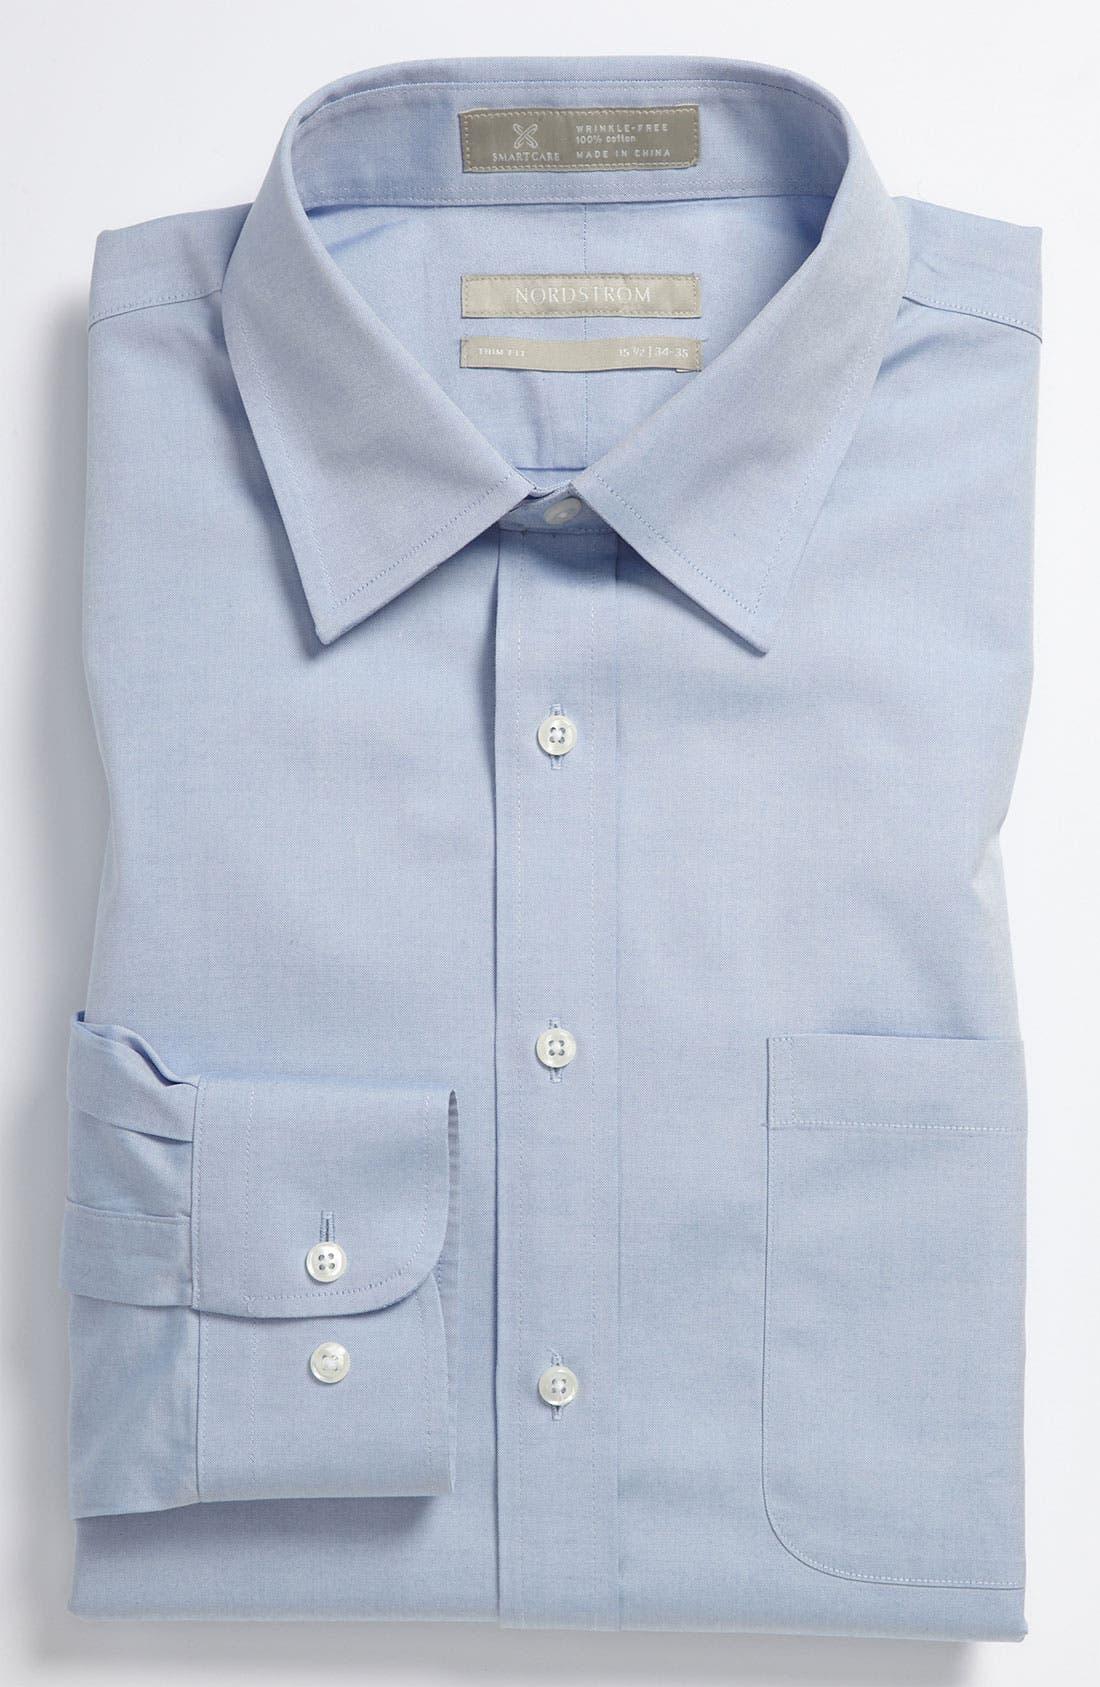 Nordstrom Men's Shop Smartcare™ Trim Fit Solid Dress Shirt